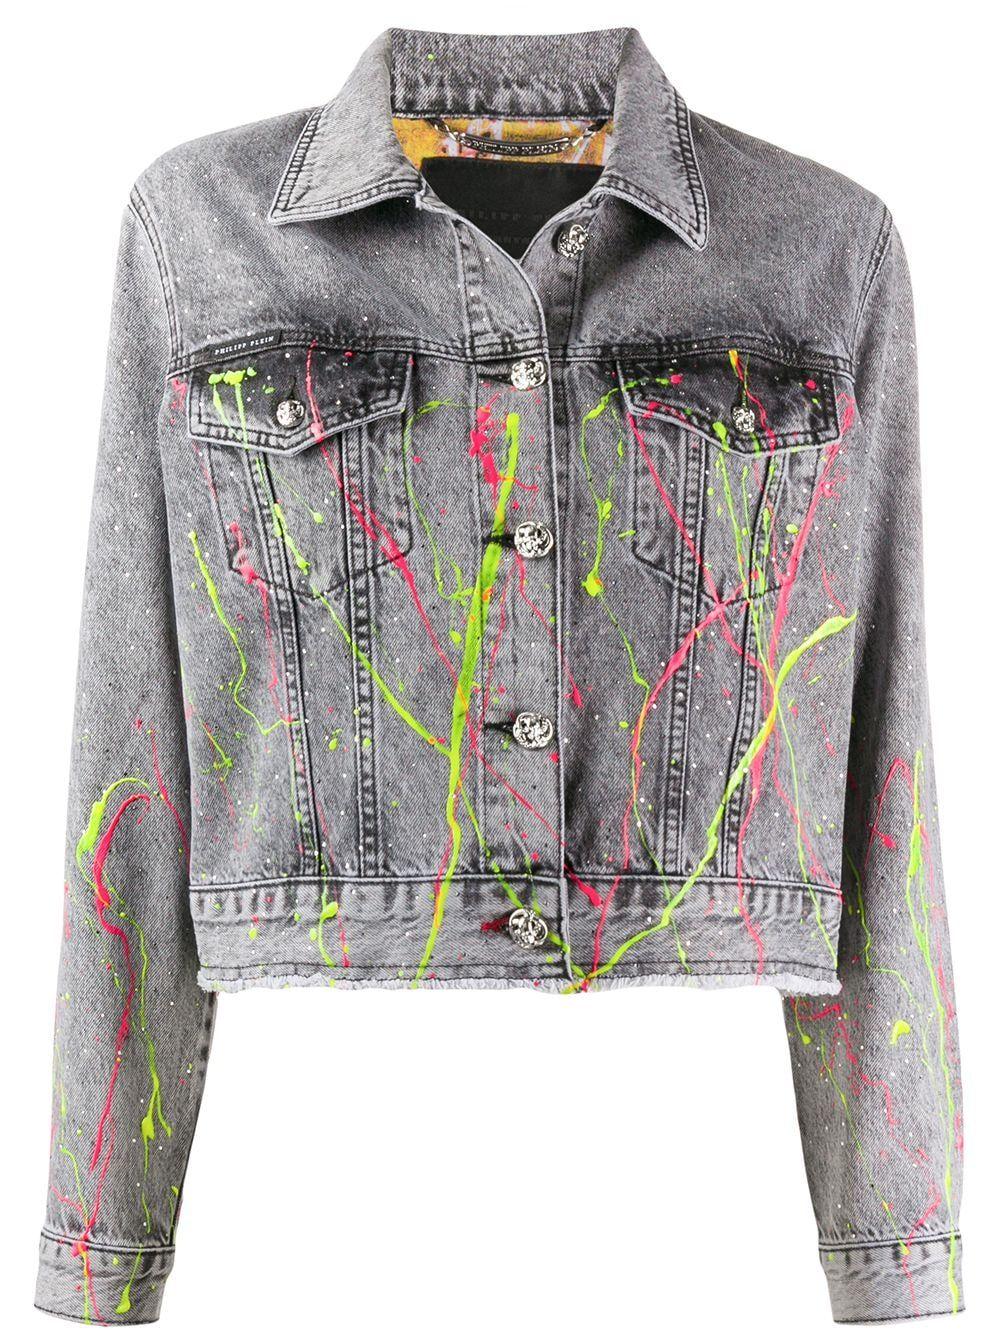 Philipp Plein Paint Splatter Denim Jacket Farfetch In 2020 Denim Jacket Diy Denim Jacket Denim Jacket Diy Paint [ 1334 x 1000 Pixel ]